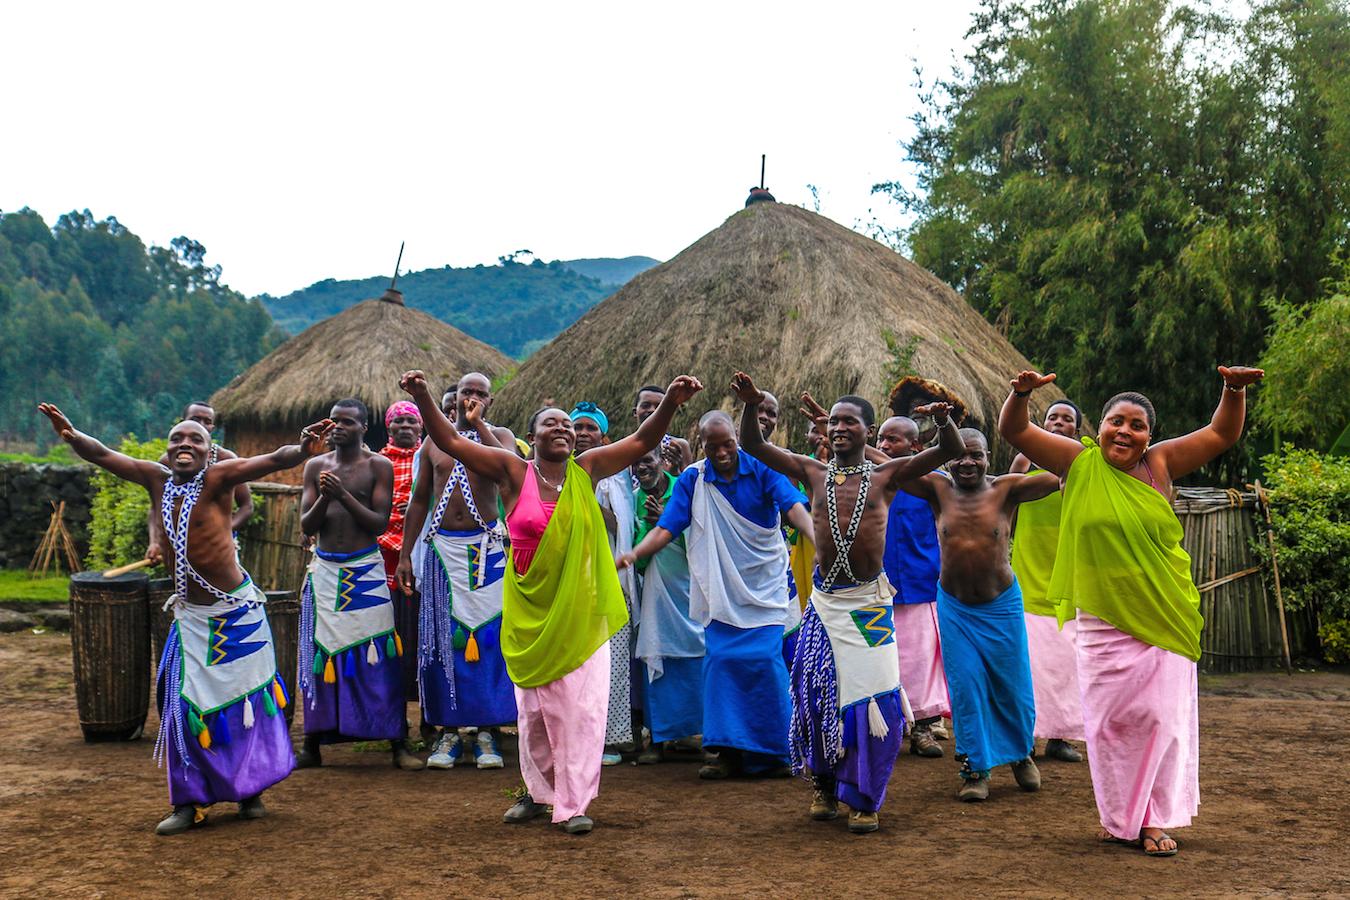 Community Tourism- Iby'lwacu Cultural Village, Rwanda